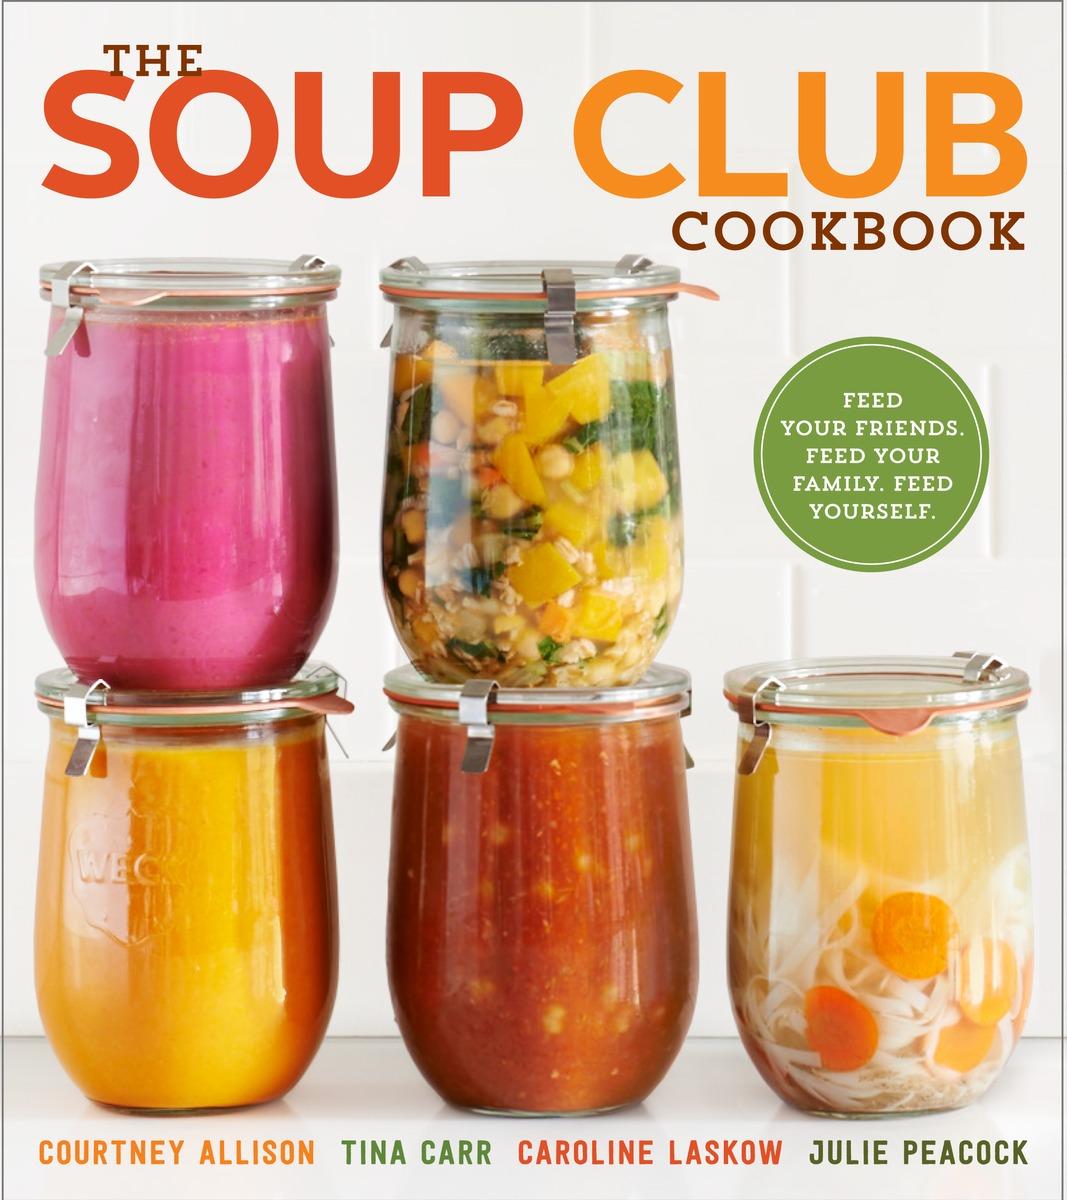 SOUP CLUB COOKBOOK, THE